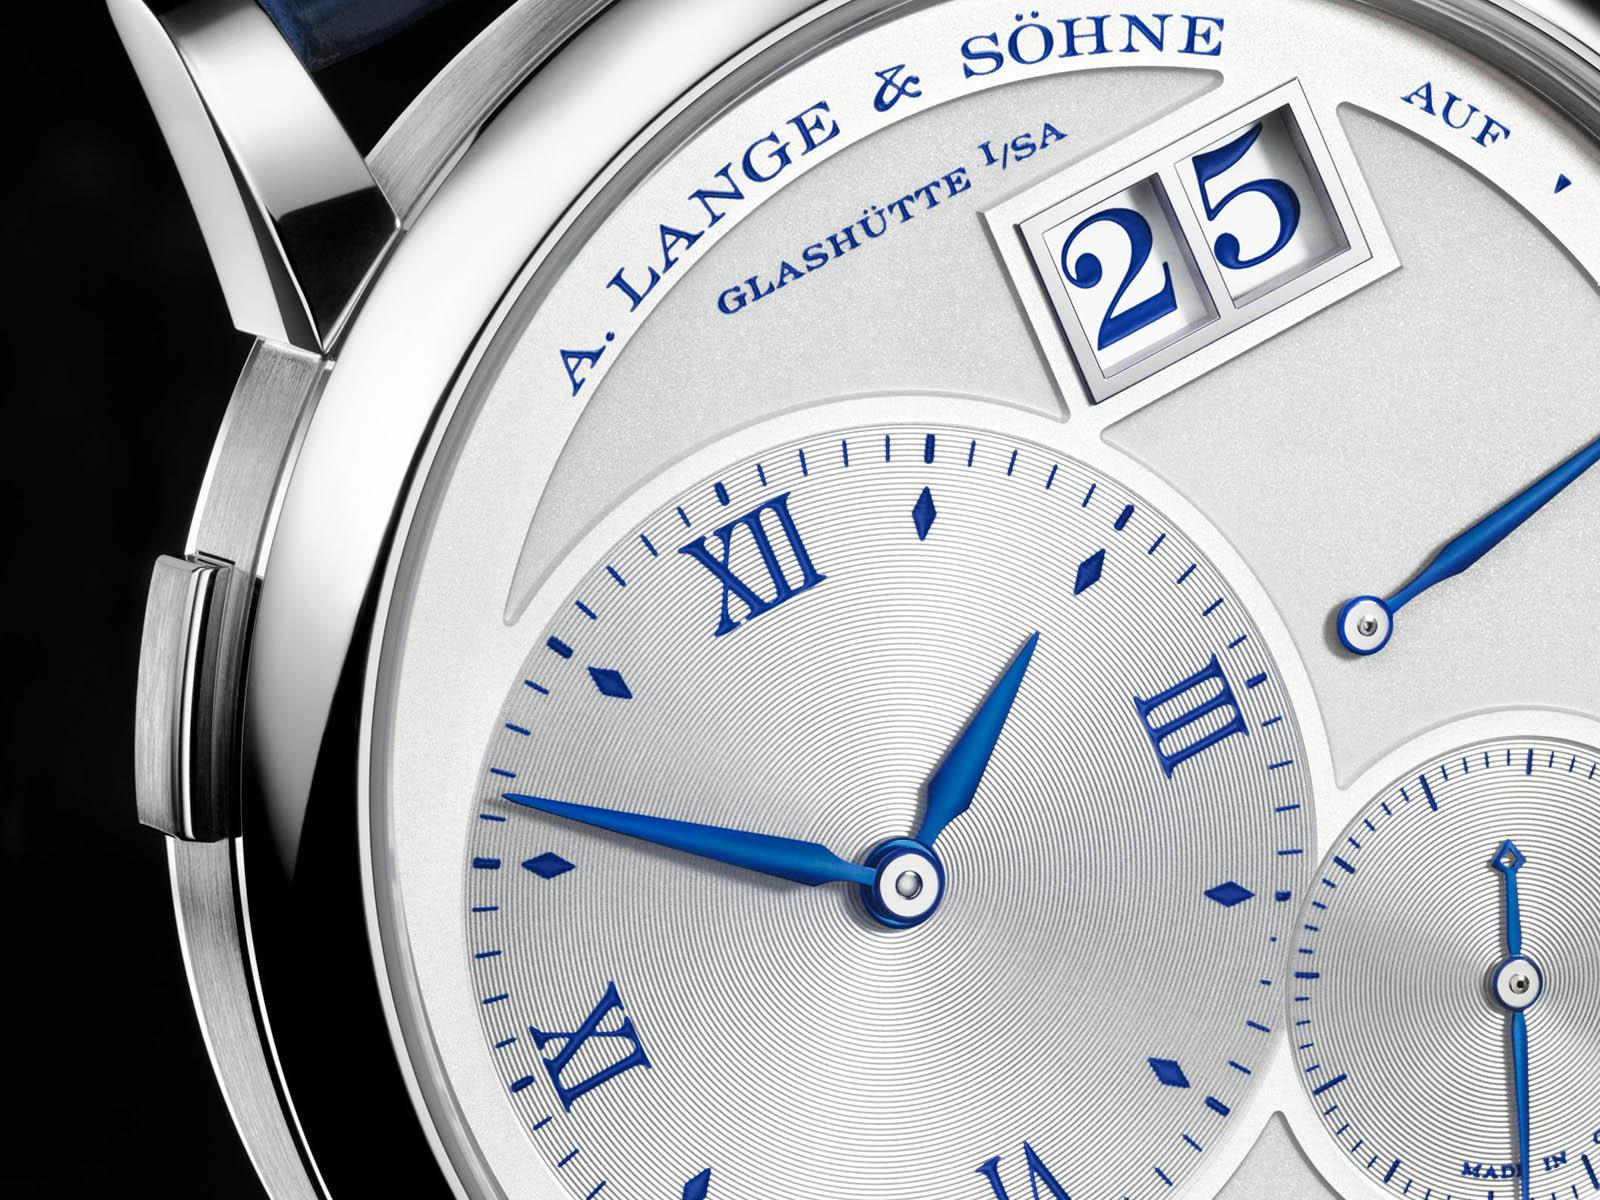 117-066-a-lange-sohne-grand-lange-1-25th-anniversary-4.jpg